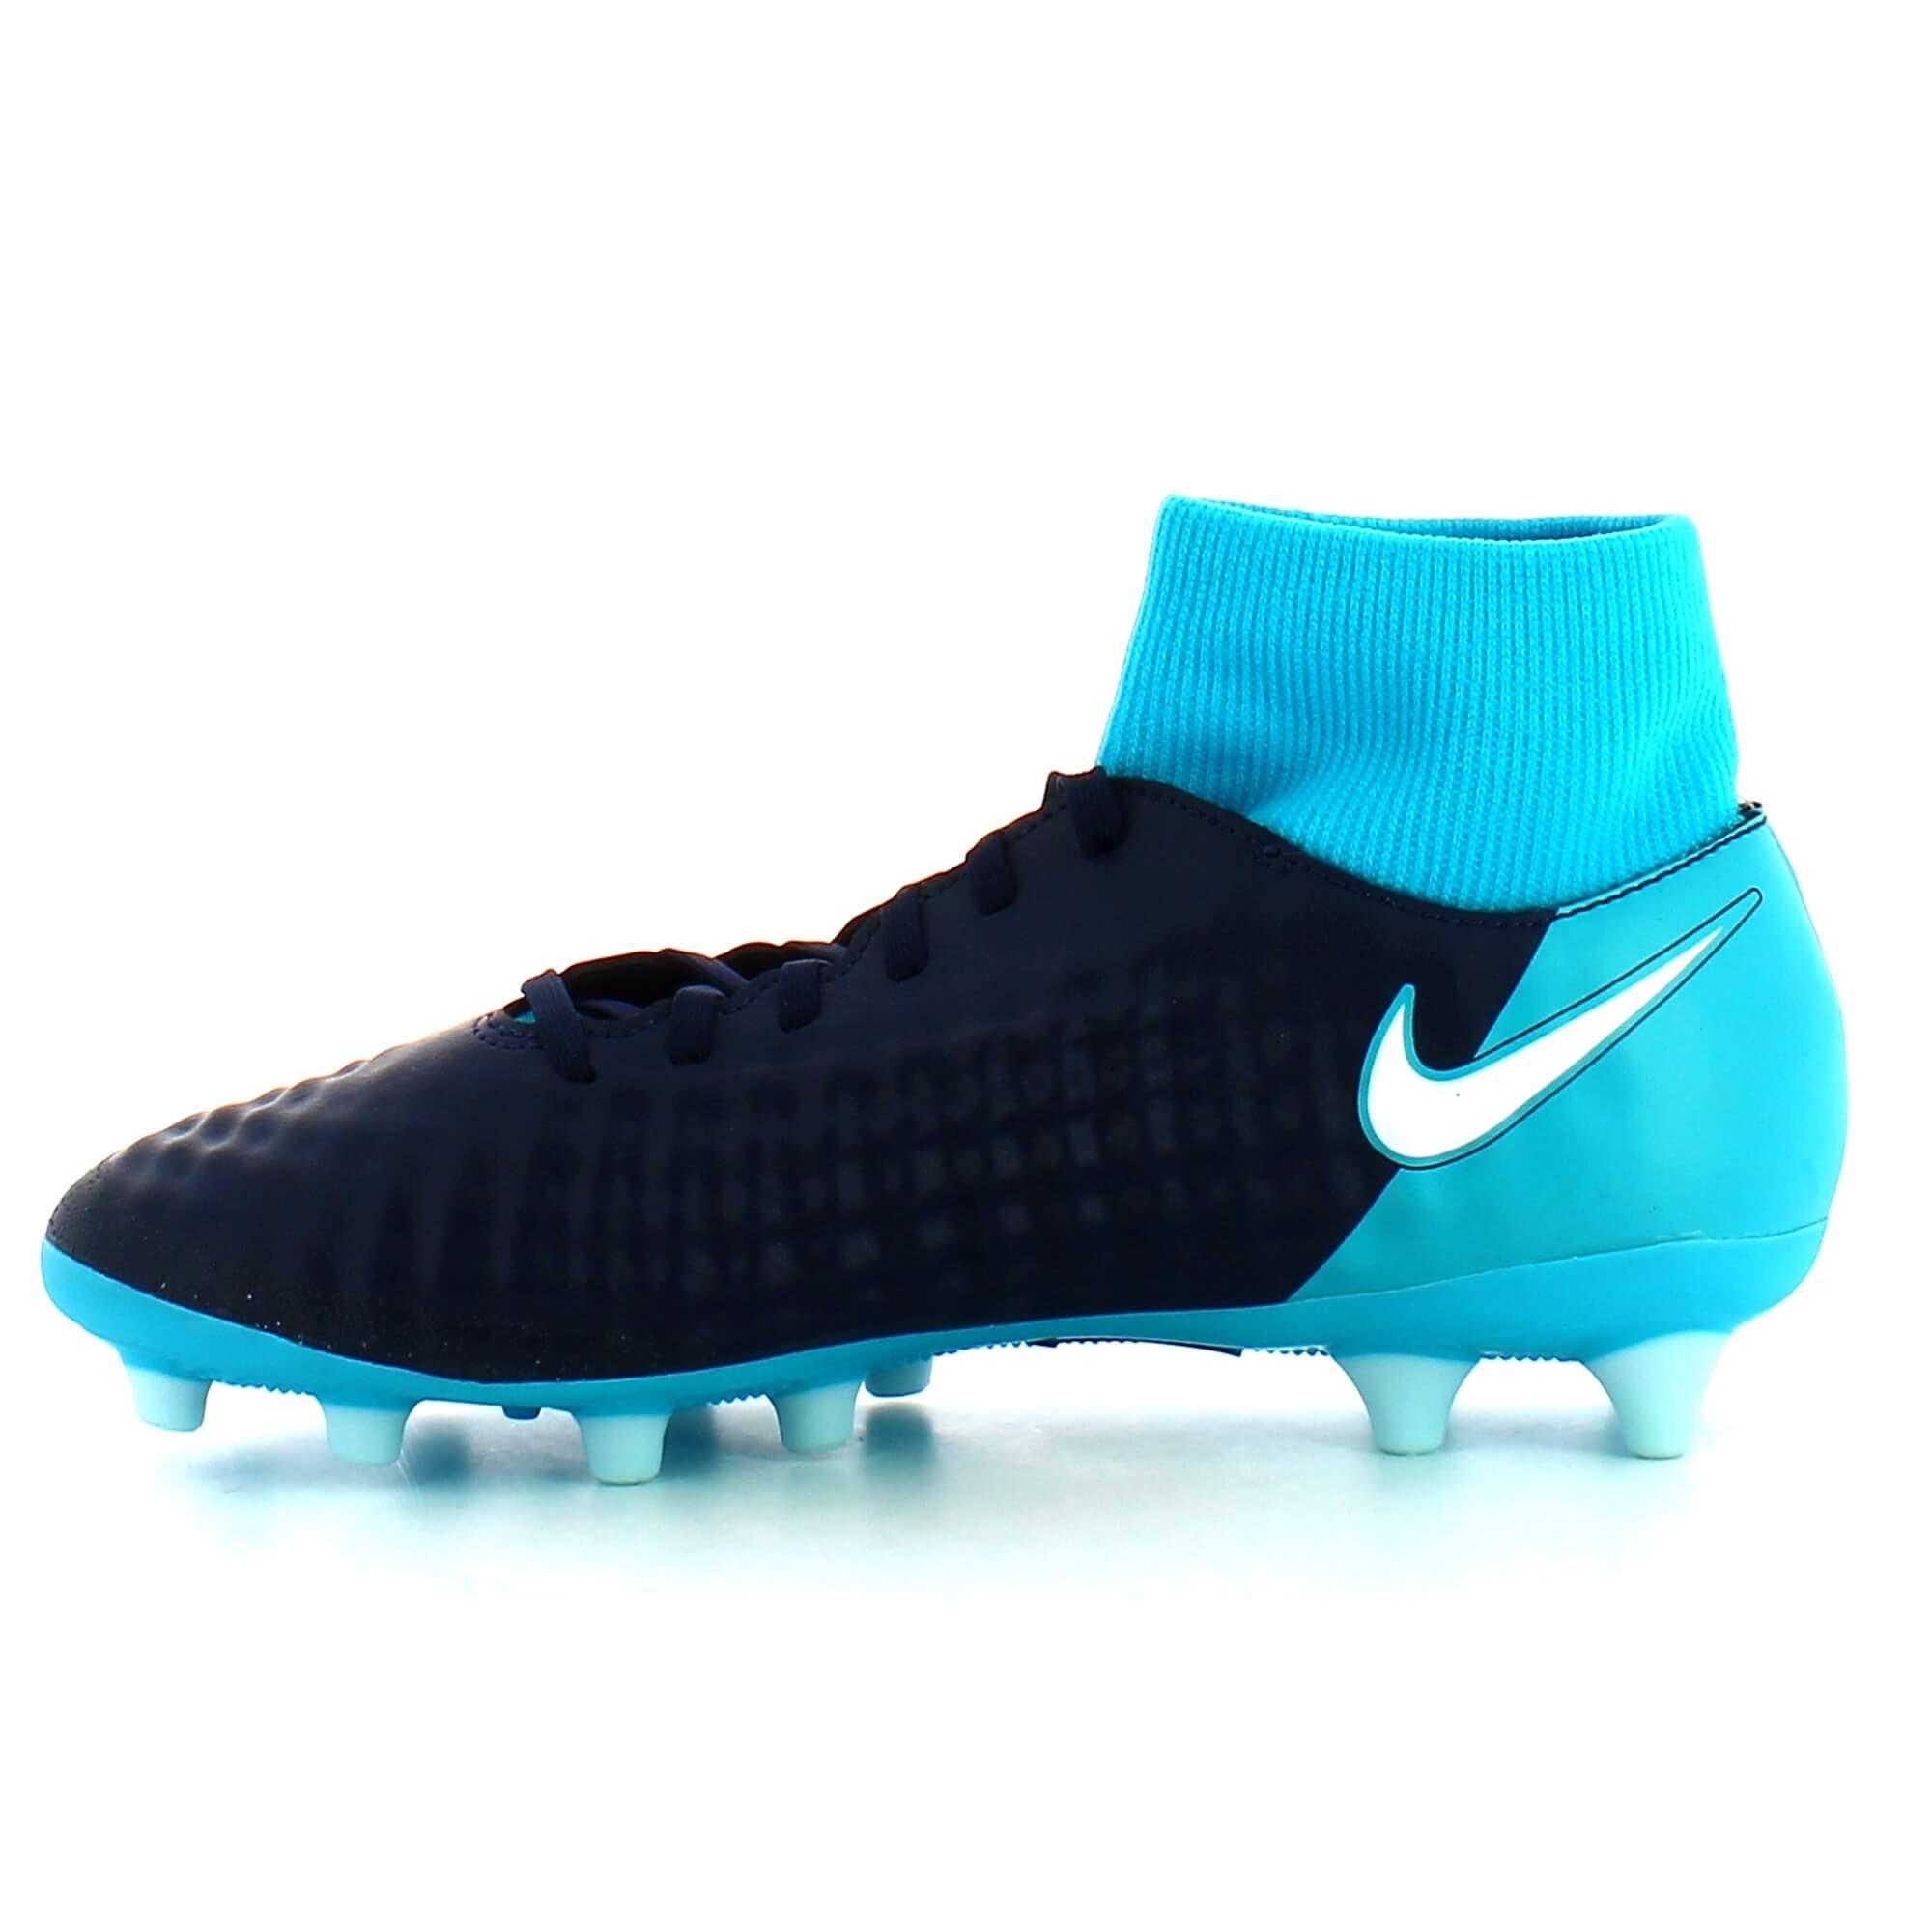 bf0375f9 Botas de Fútbol Nike Magista Onda II Df Ag-Pro Azul Hombre - Deportes Moya